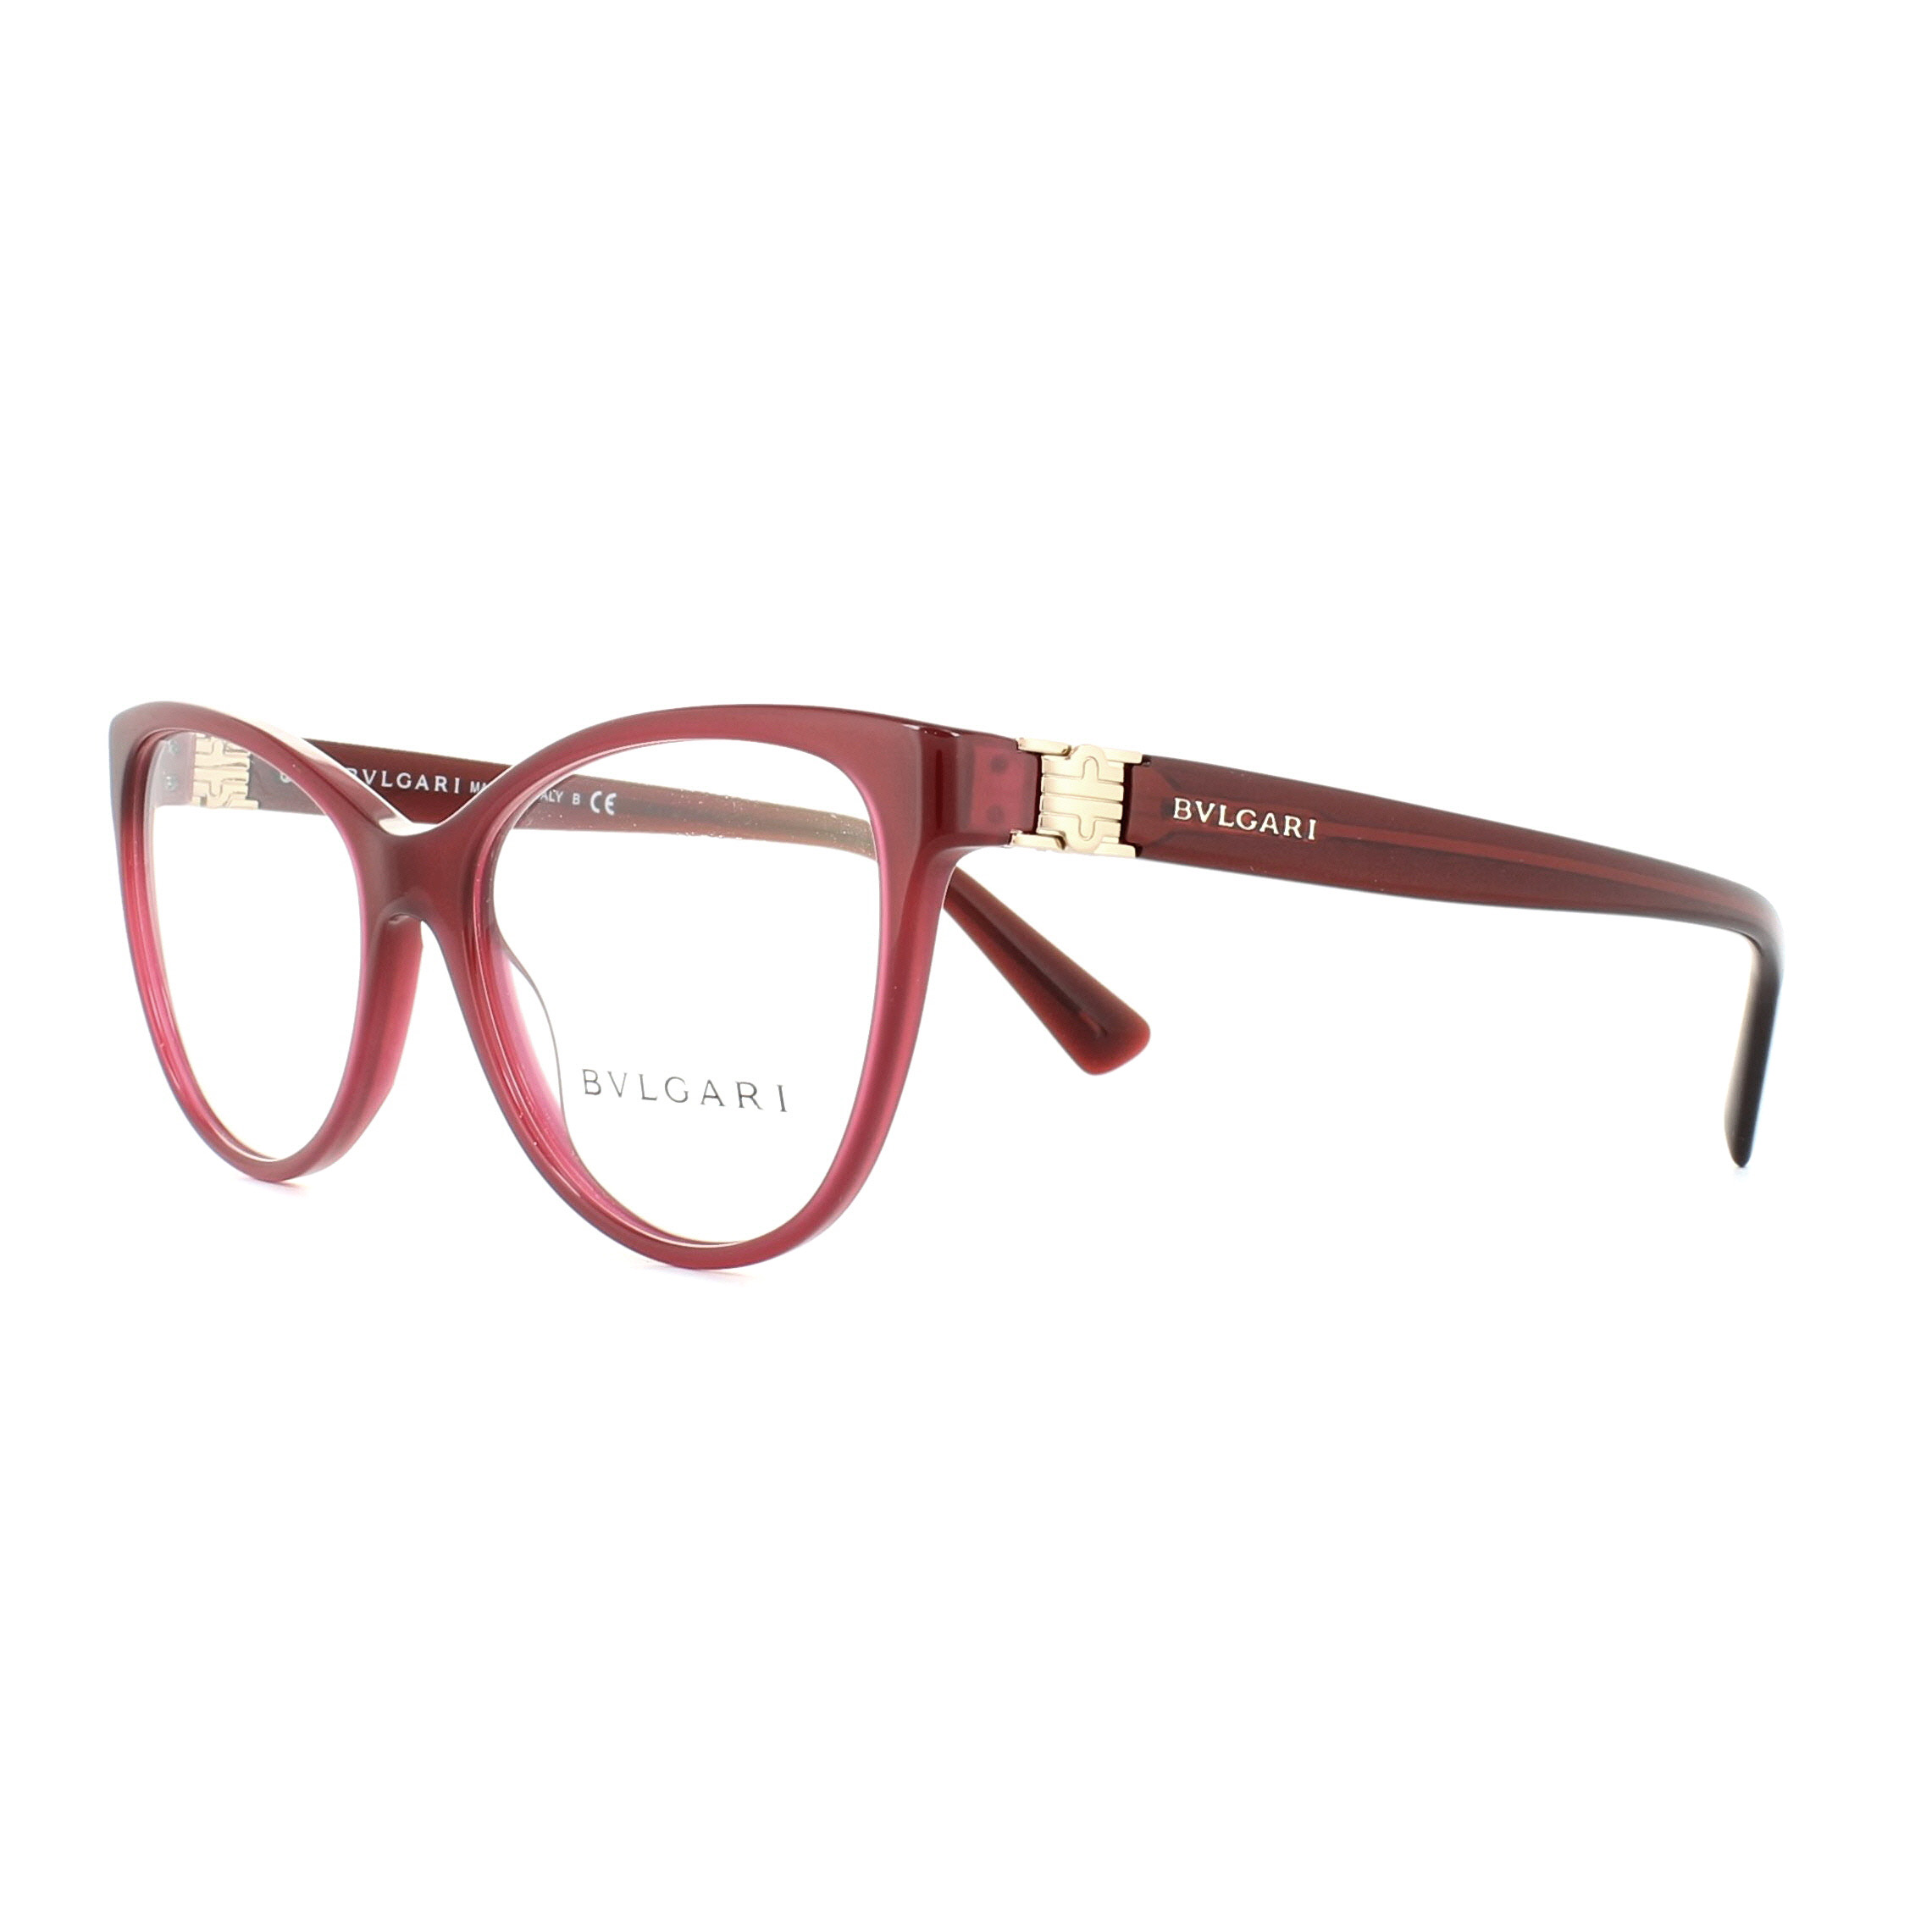 Bvlgari Glasses Frames 4151 5333 Transparent Red 52mm Womens ...